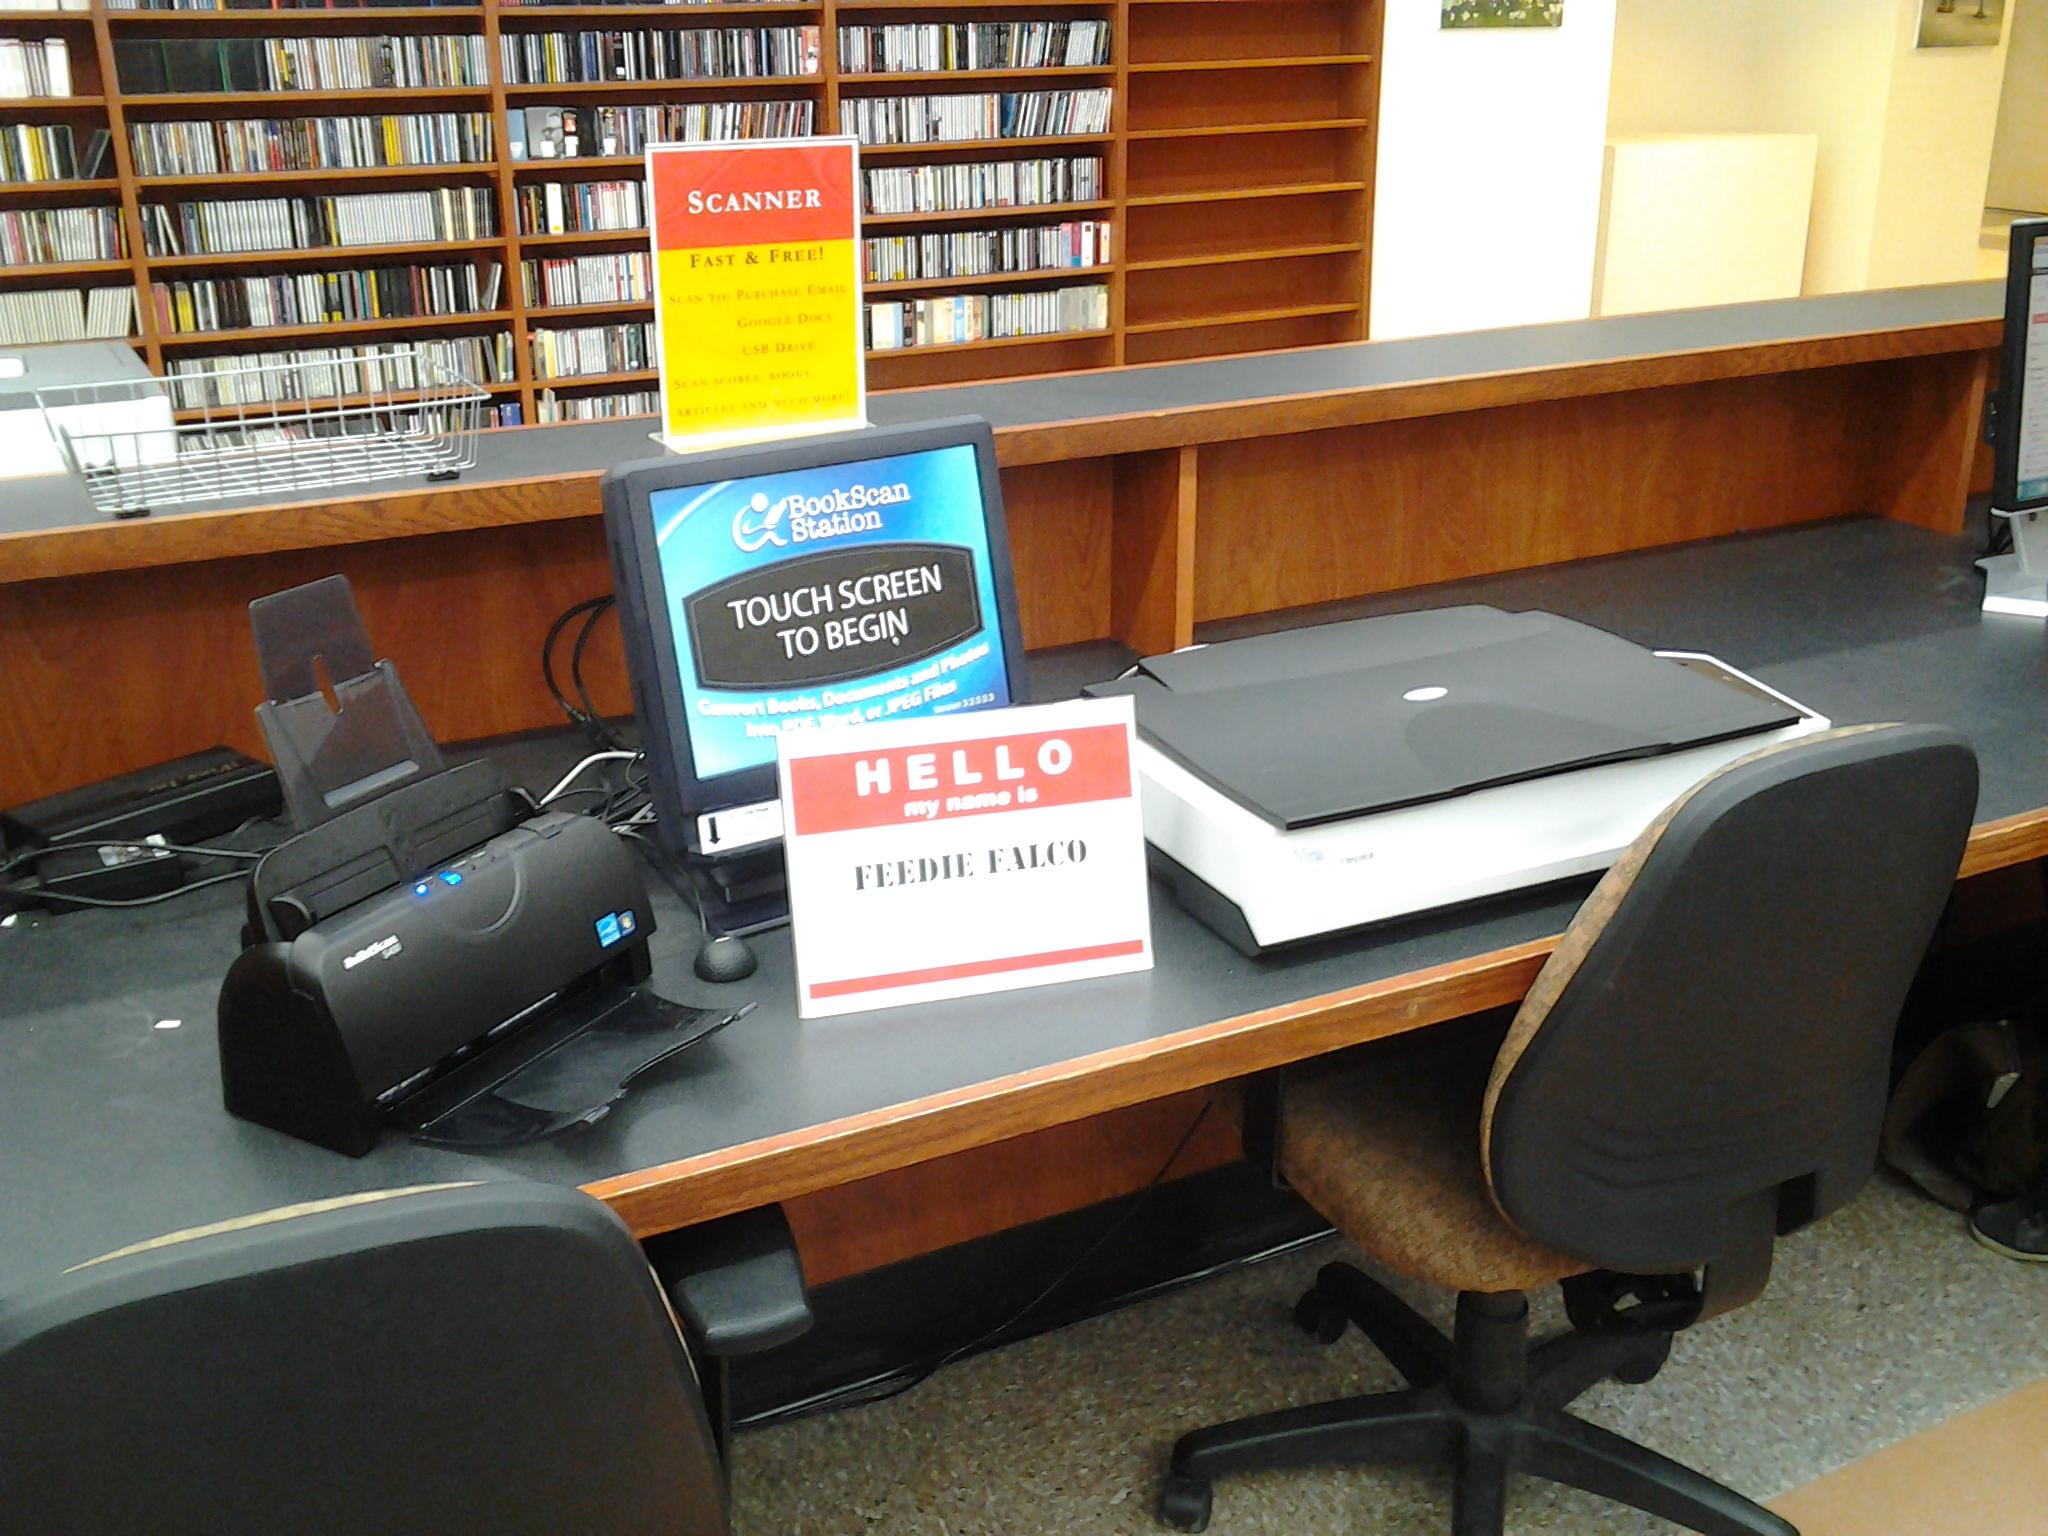 Second book scanning station